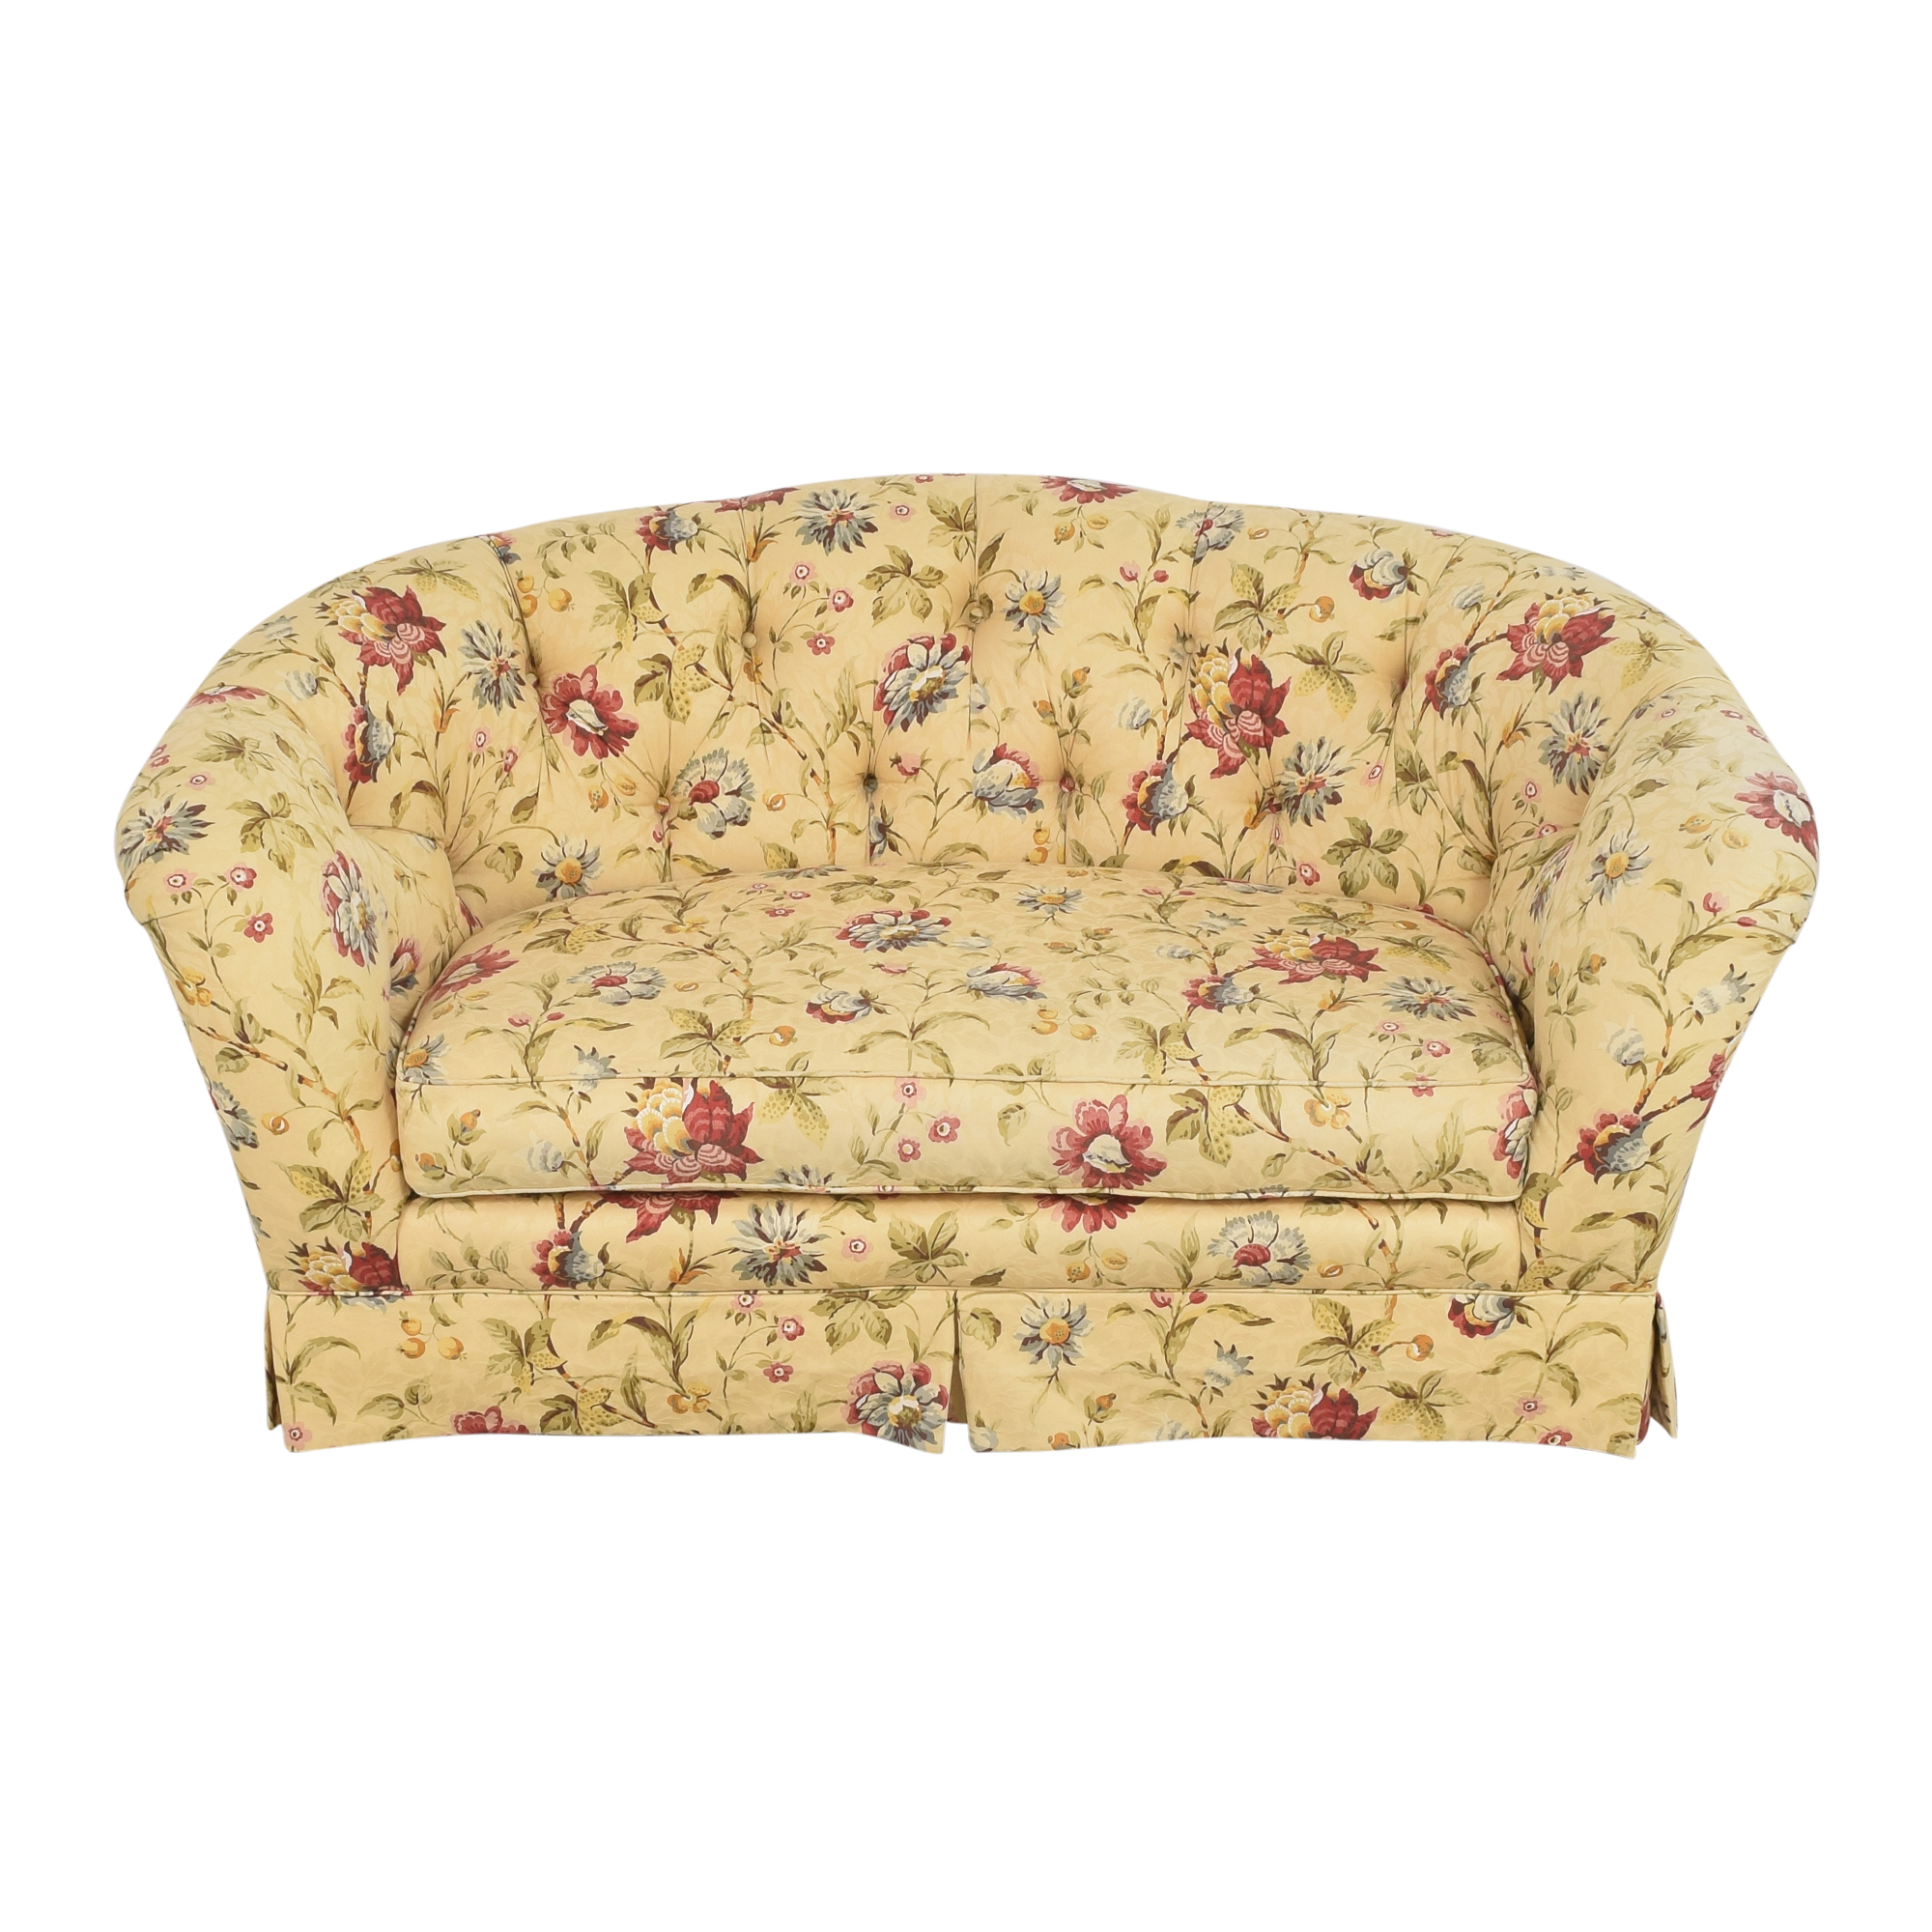 Ethan Allen Ethan Allen Tufted Bench Cushion Sofa used